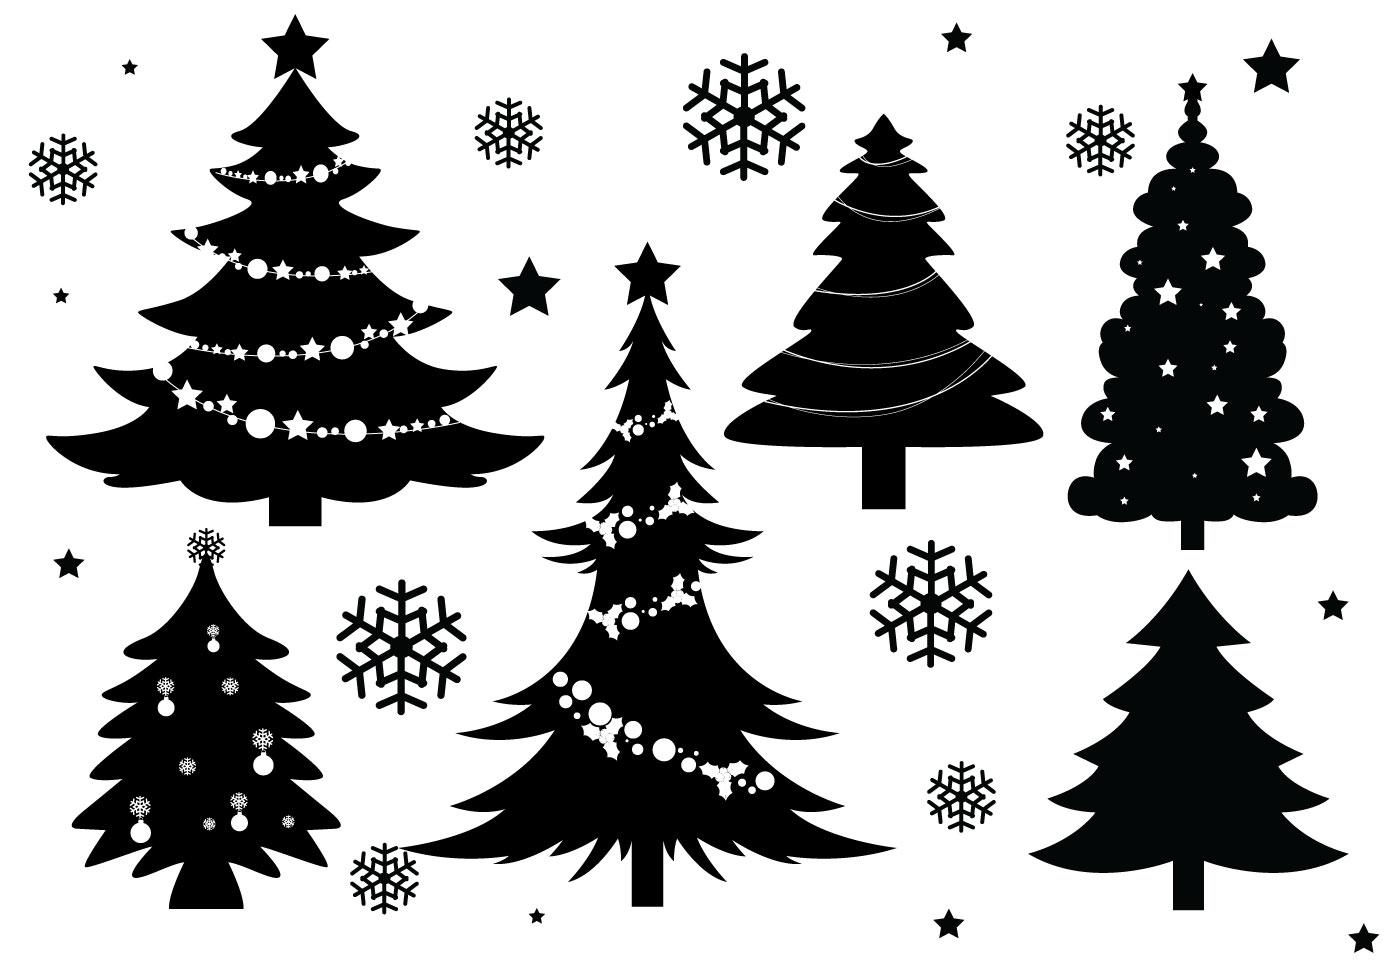 1400x980 Christmas Tree Silhouette Vectors